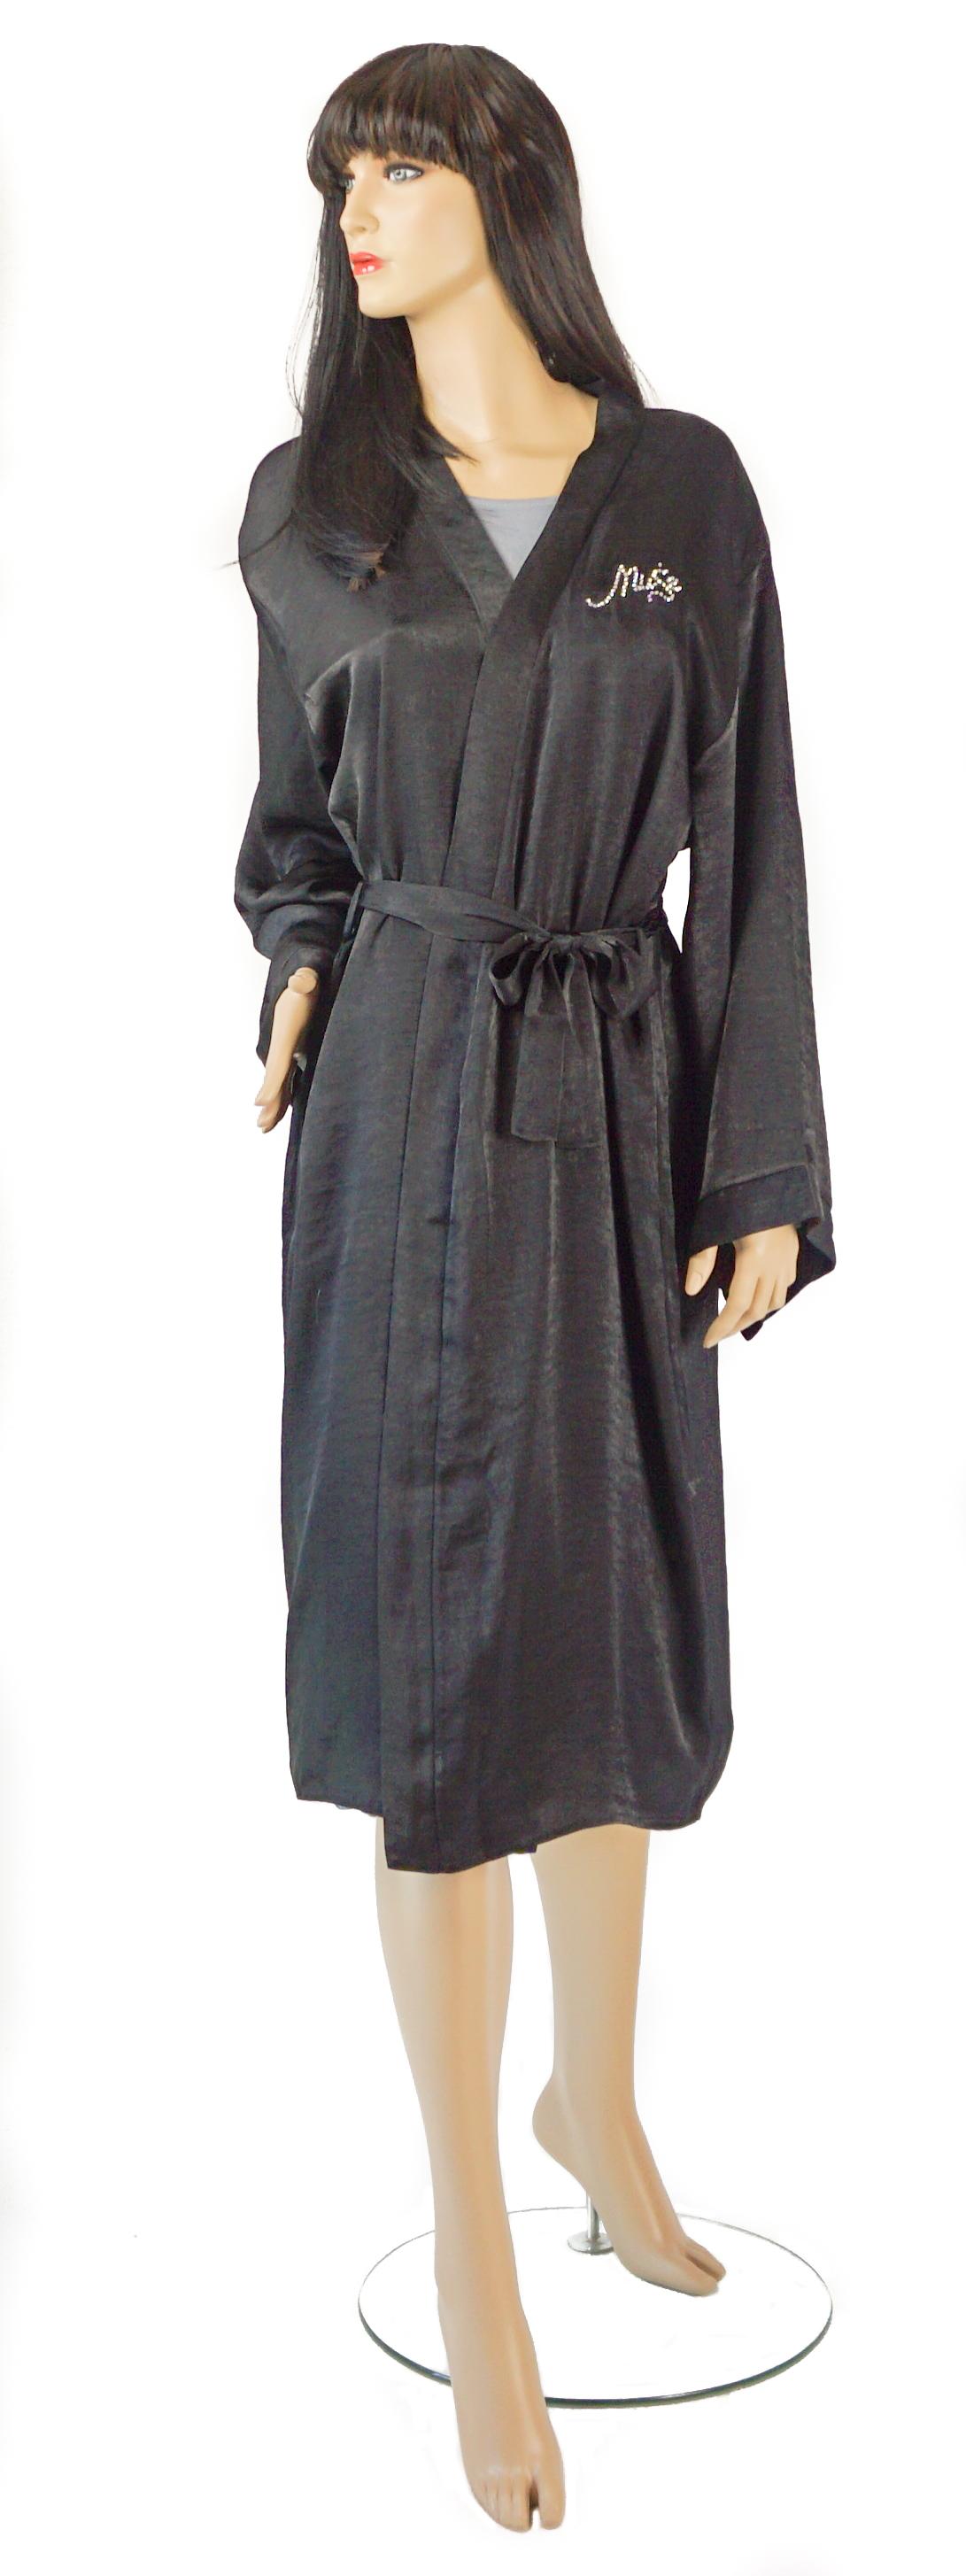 Robe-$50